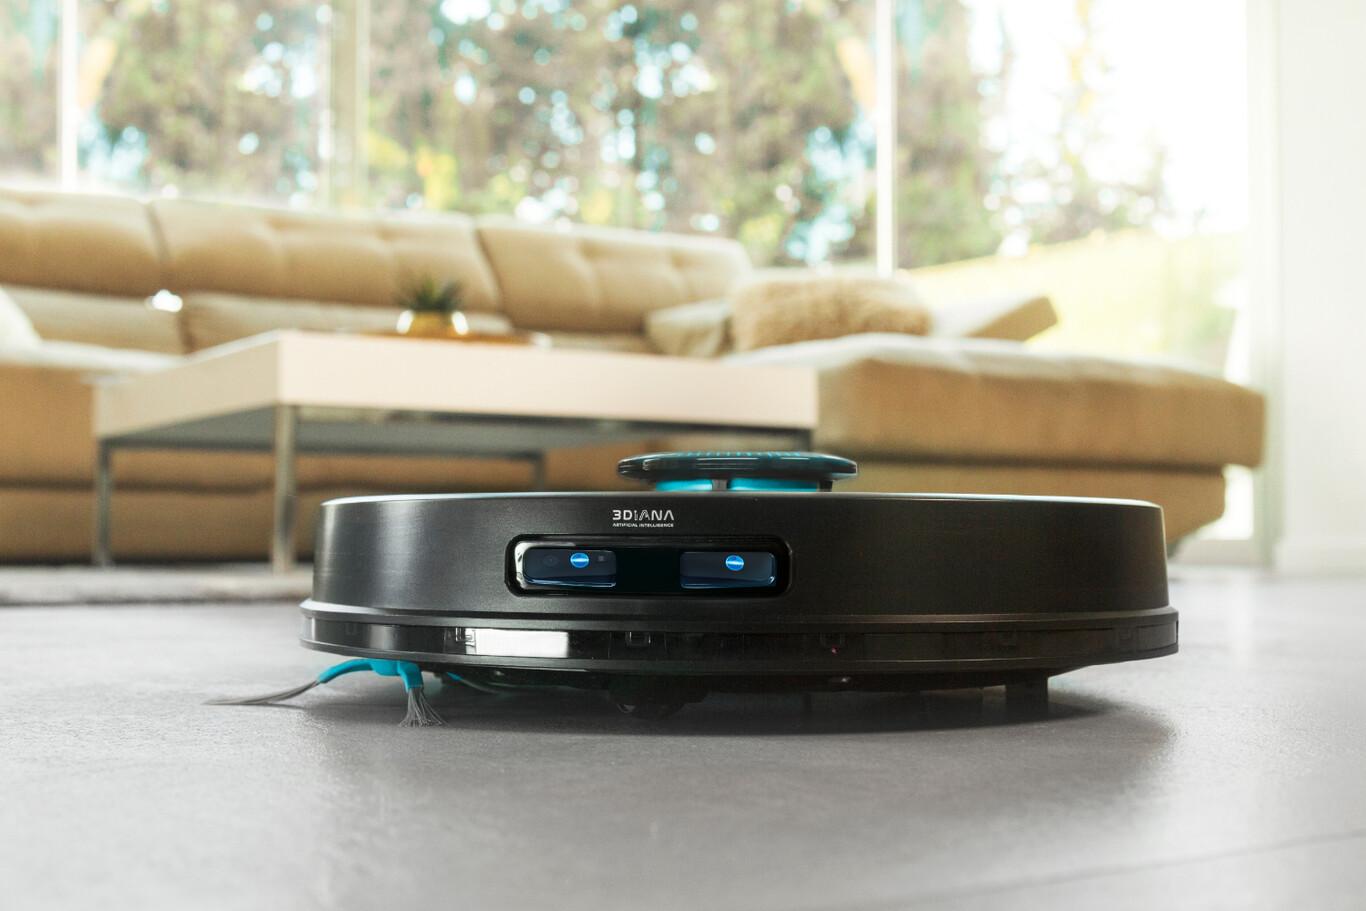 Cecotec Conga 7090: el nuevo robot aspirador tiene cámara e inteligencia artificial para detectar objetos